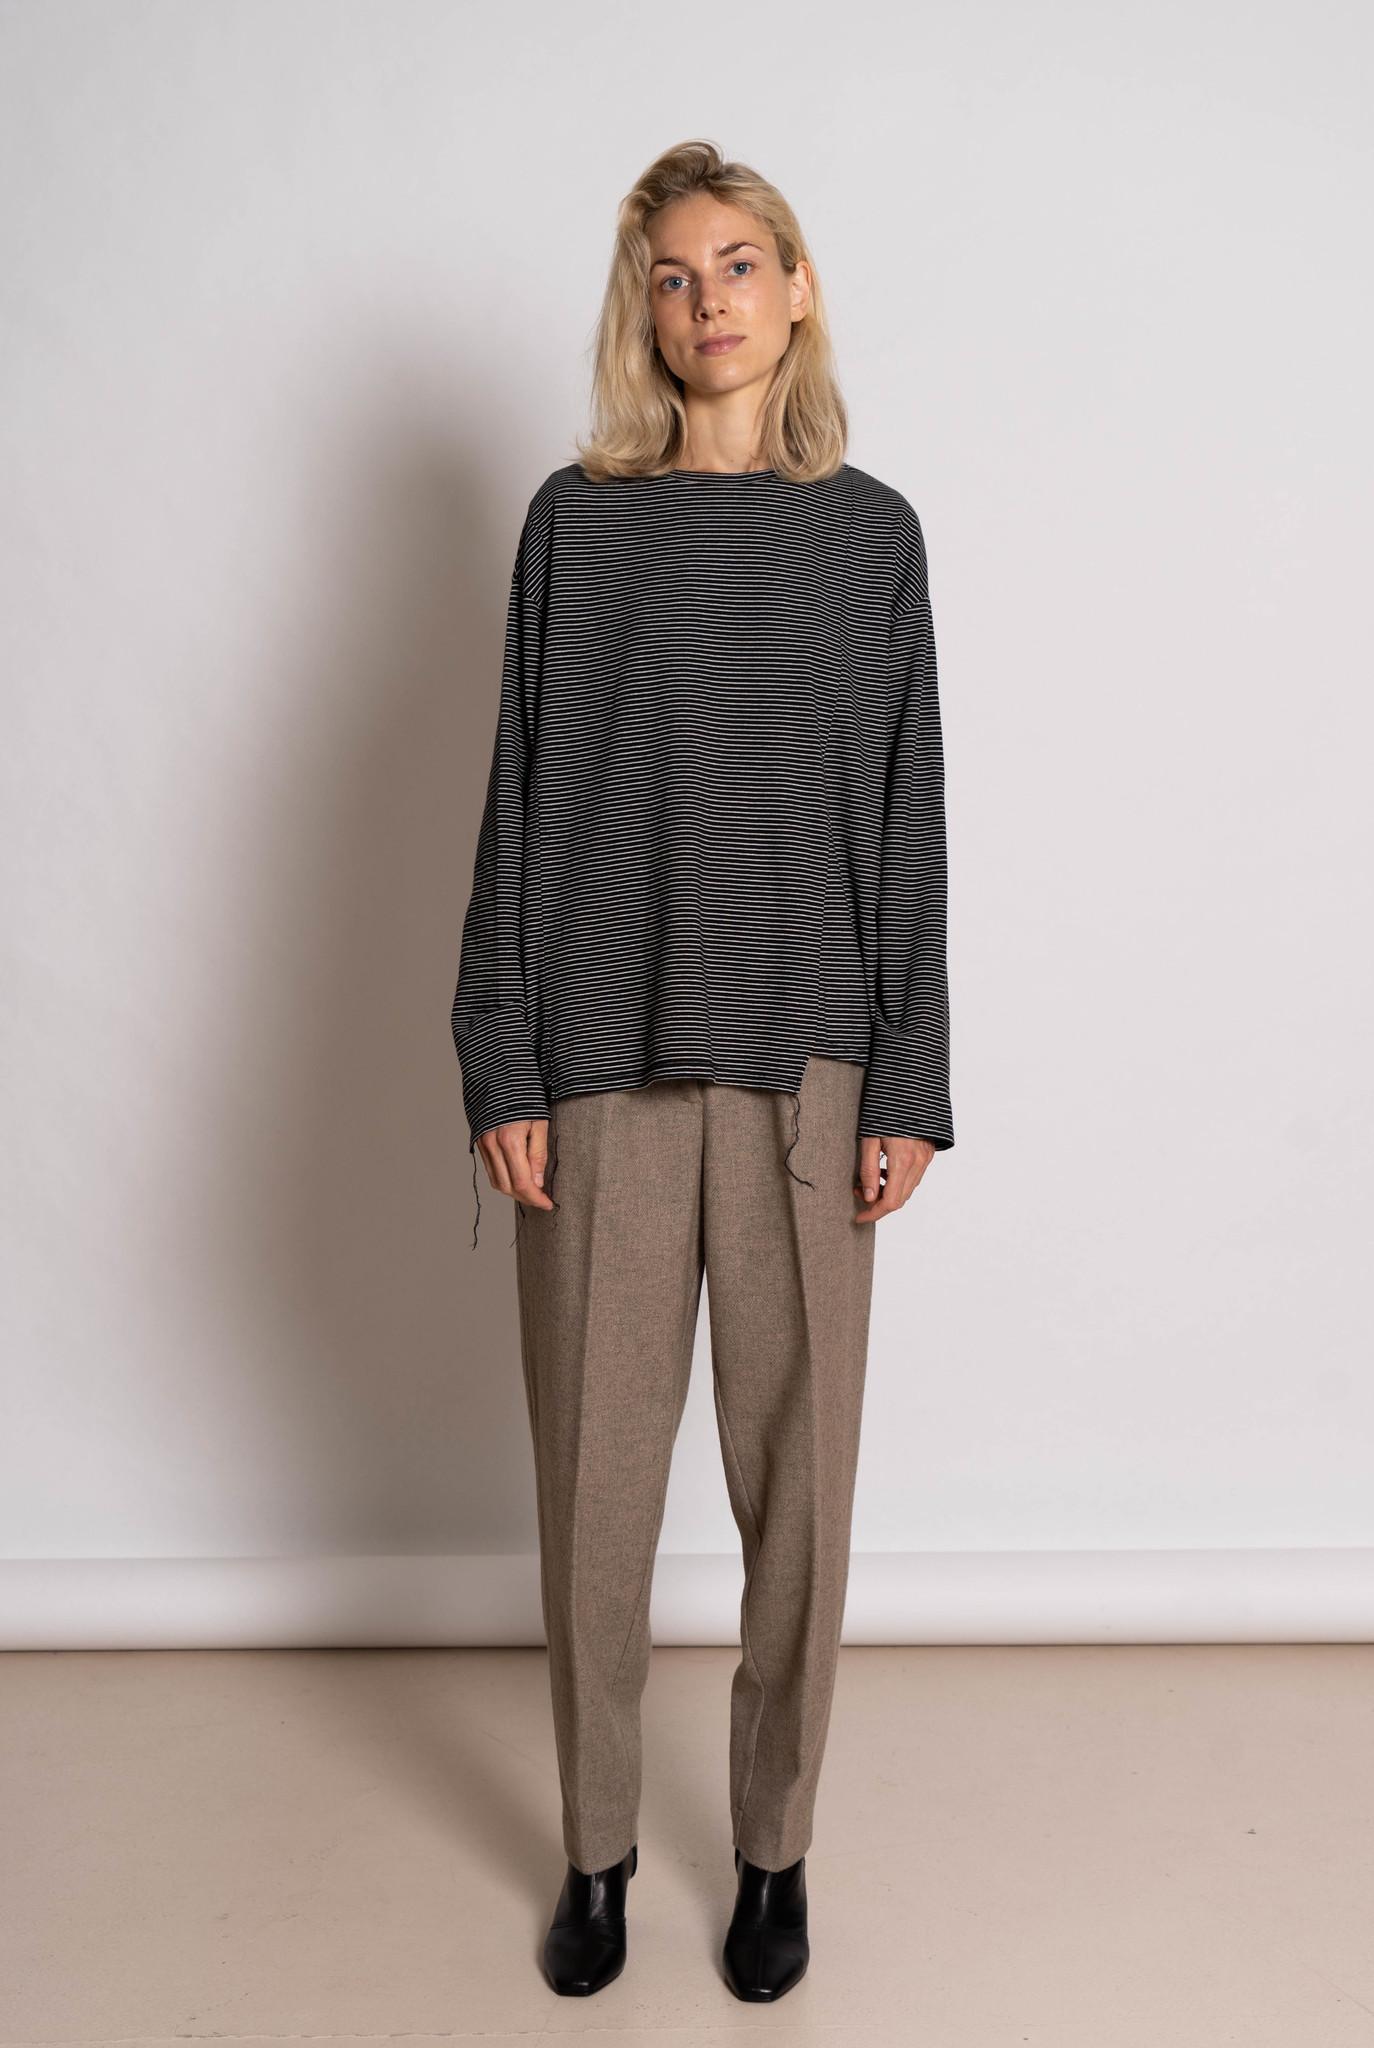 Stripe Mixed Block Longsleeve T-shirt Black/White